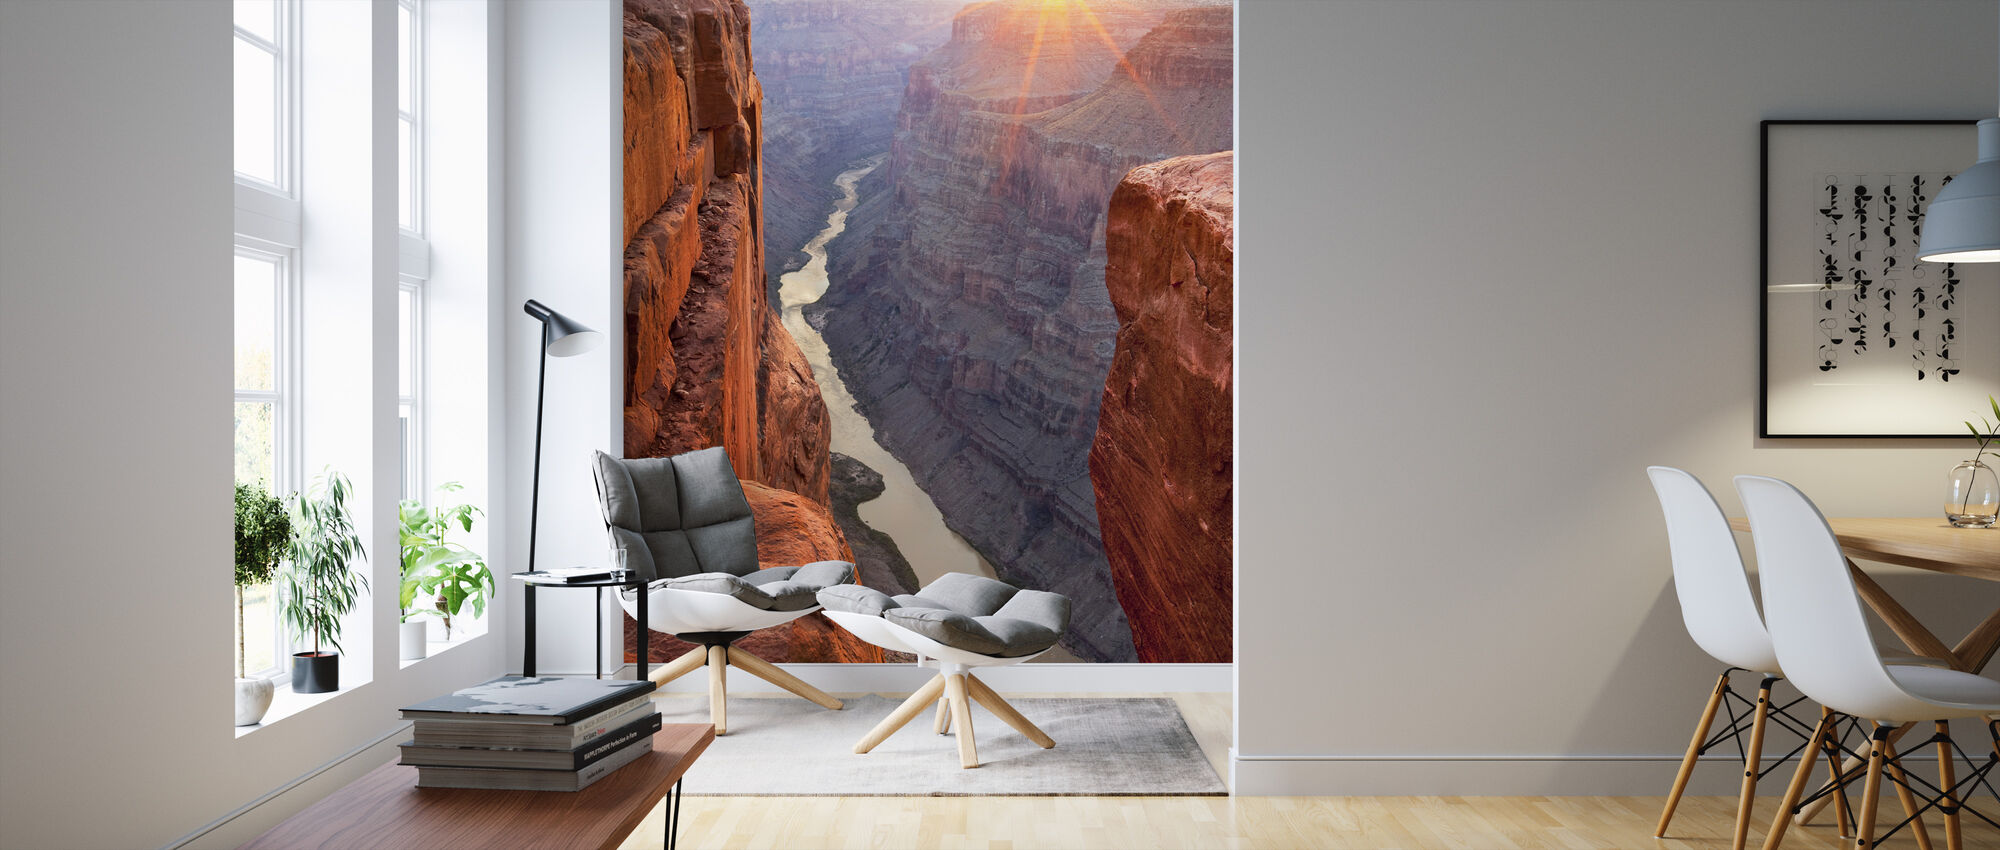 Zonsopgang Over de Grand Canyon, Arizona - Behang - Woonkamer